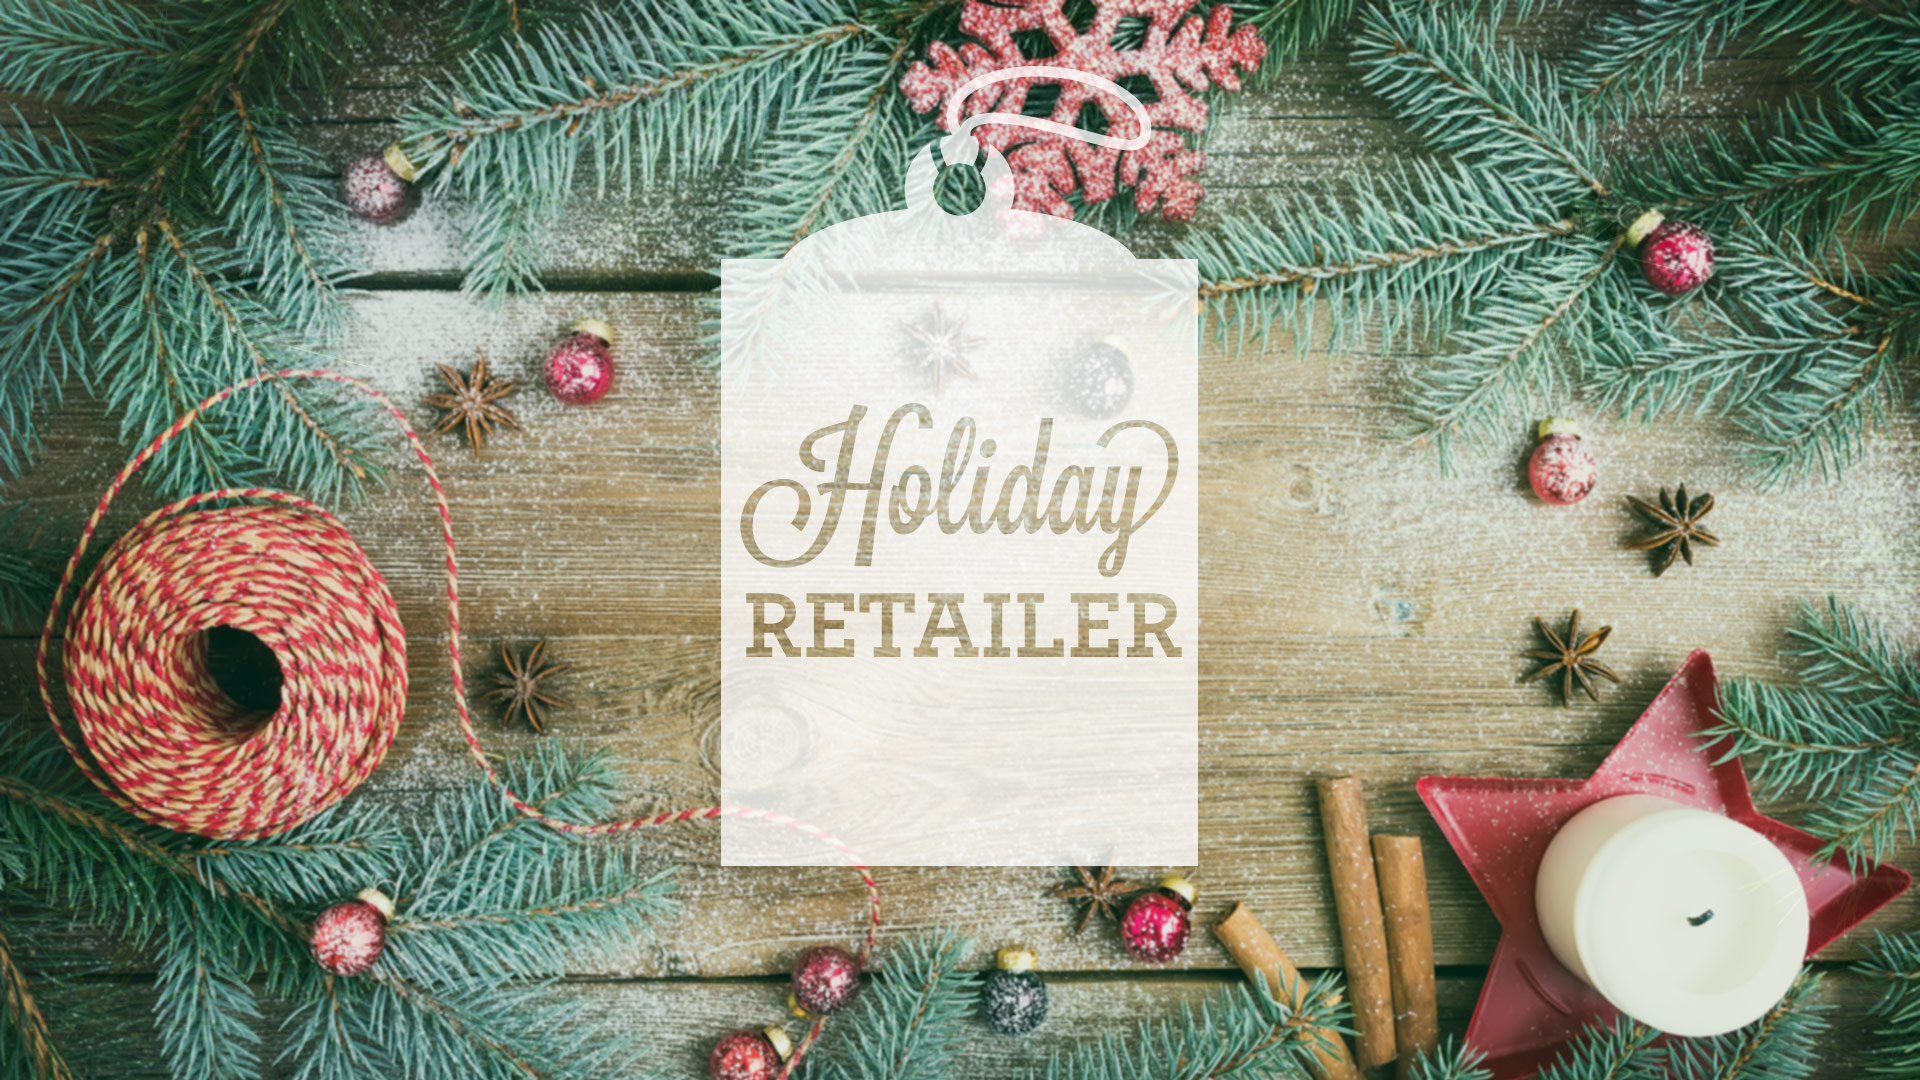 holiday-retailer2016h-fade-ss-1920